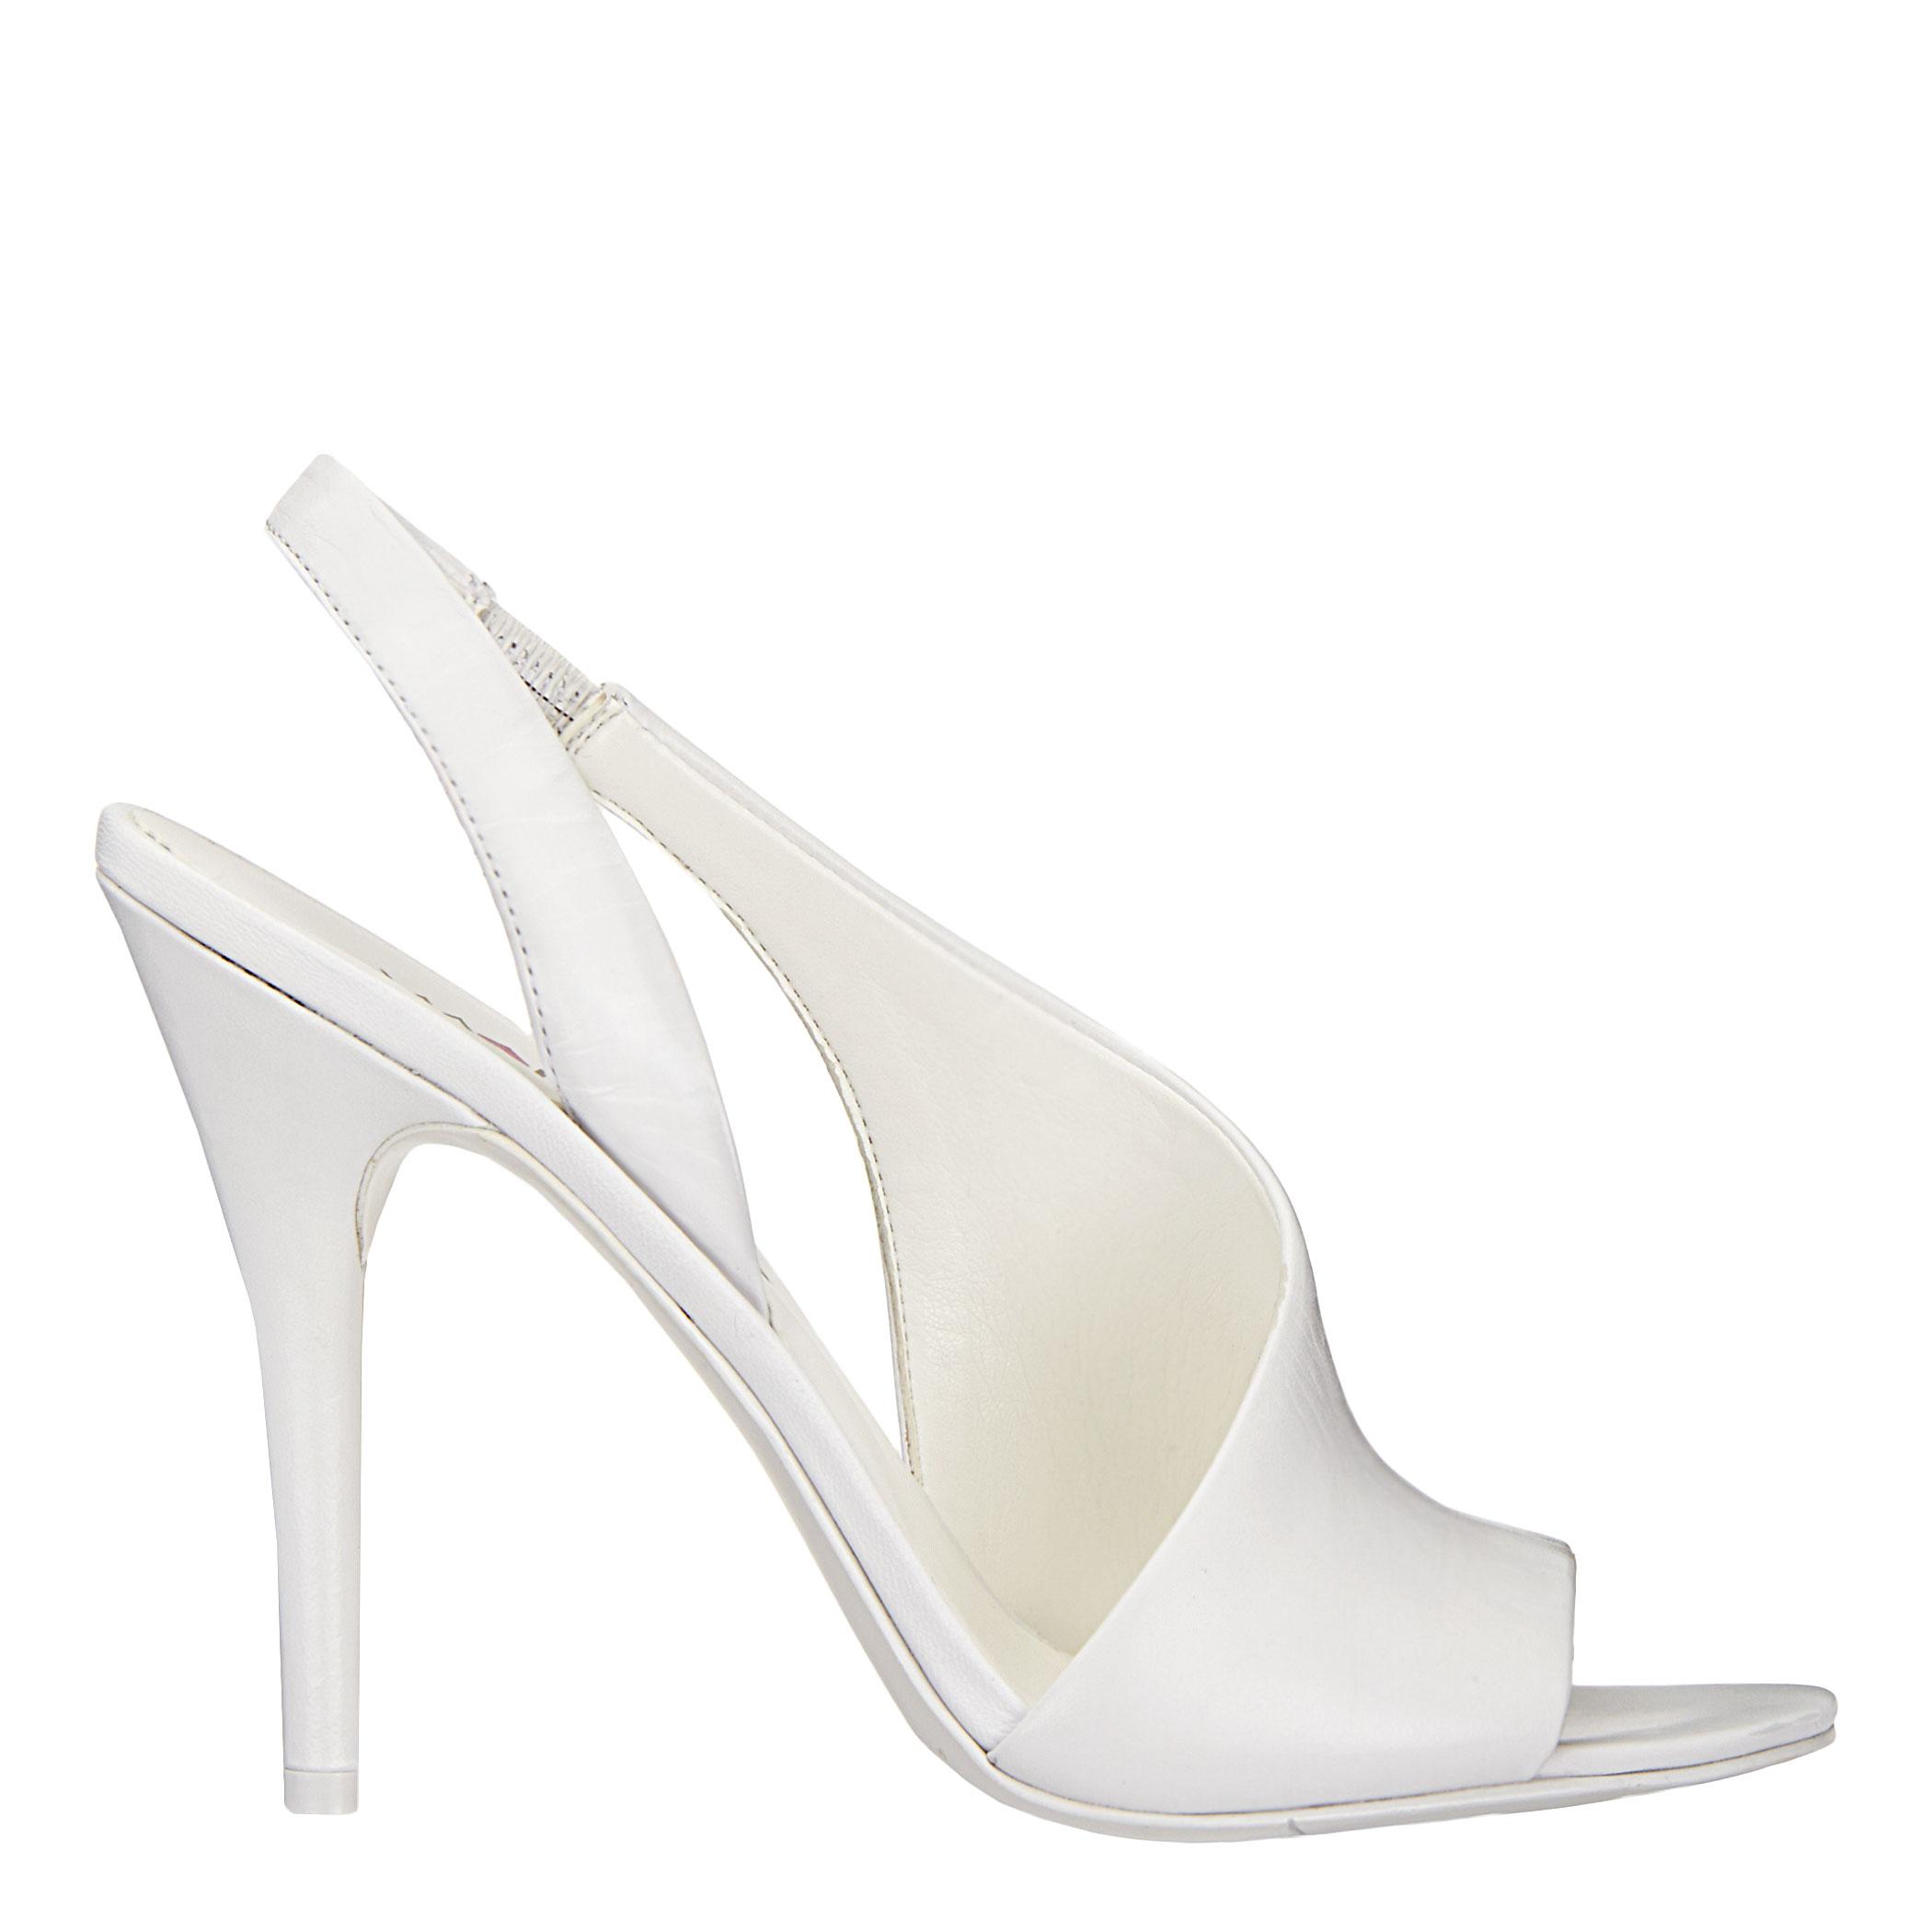 Nine west Aila Sling Back Heels in White | Lyst